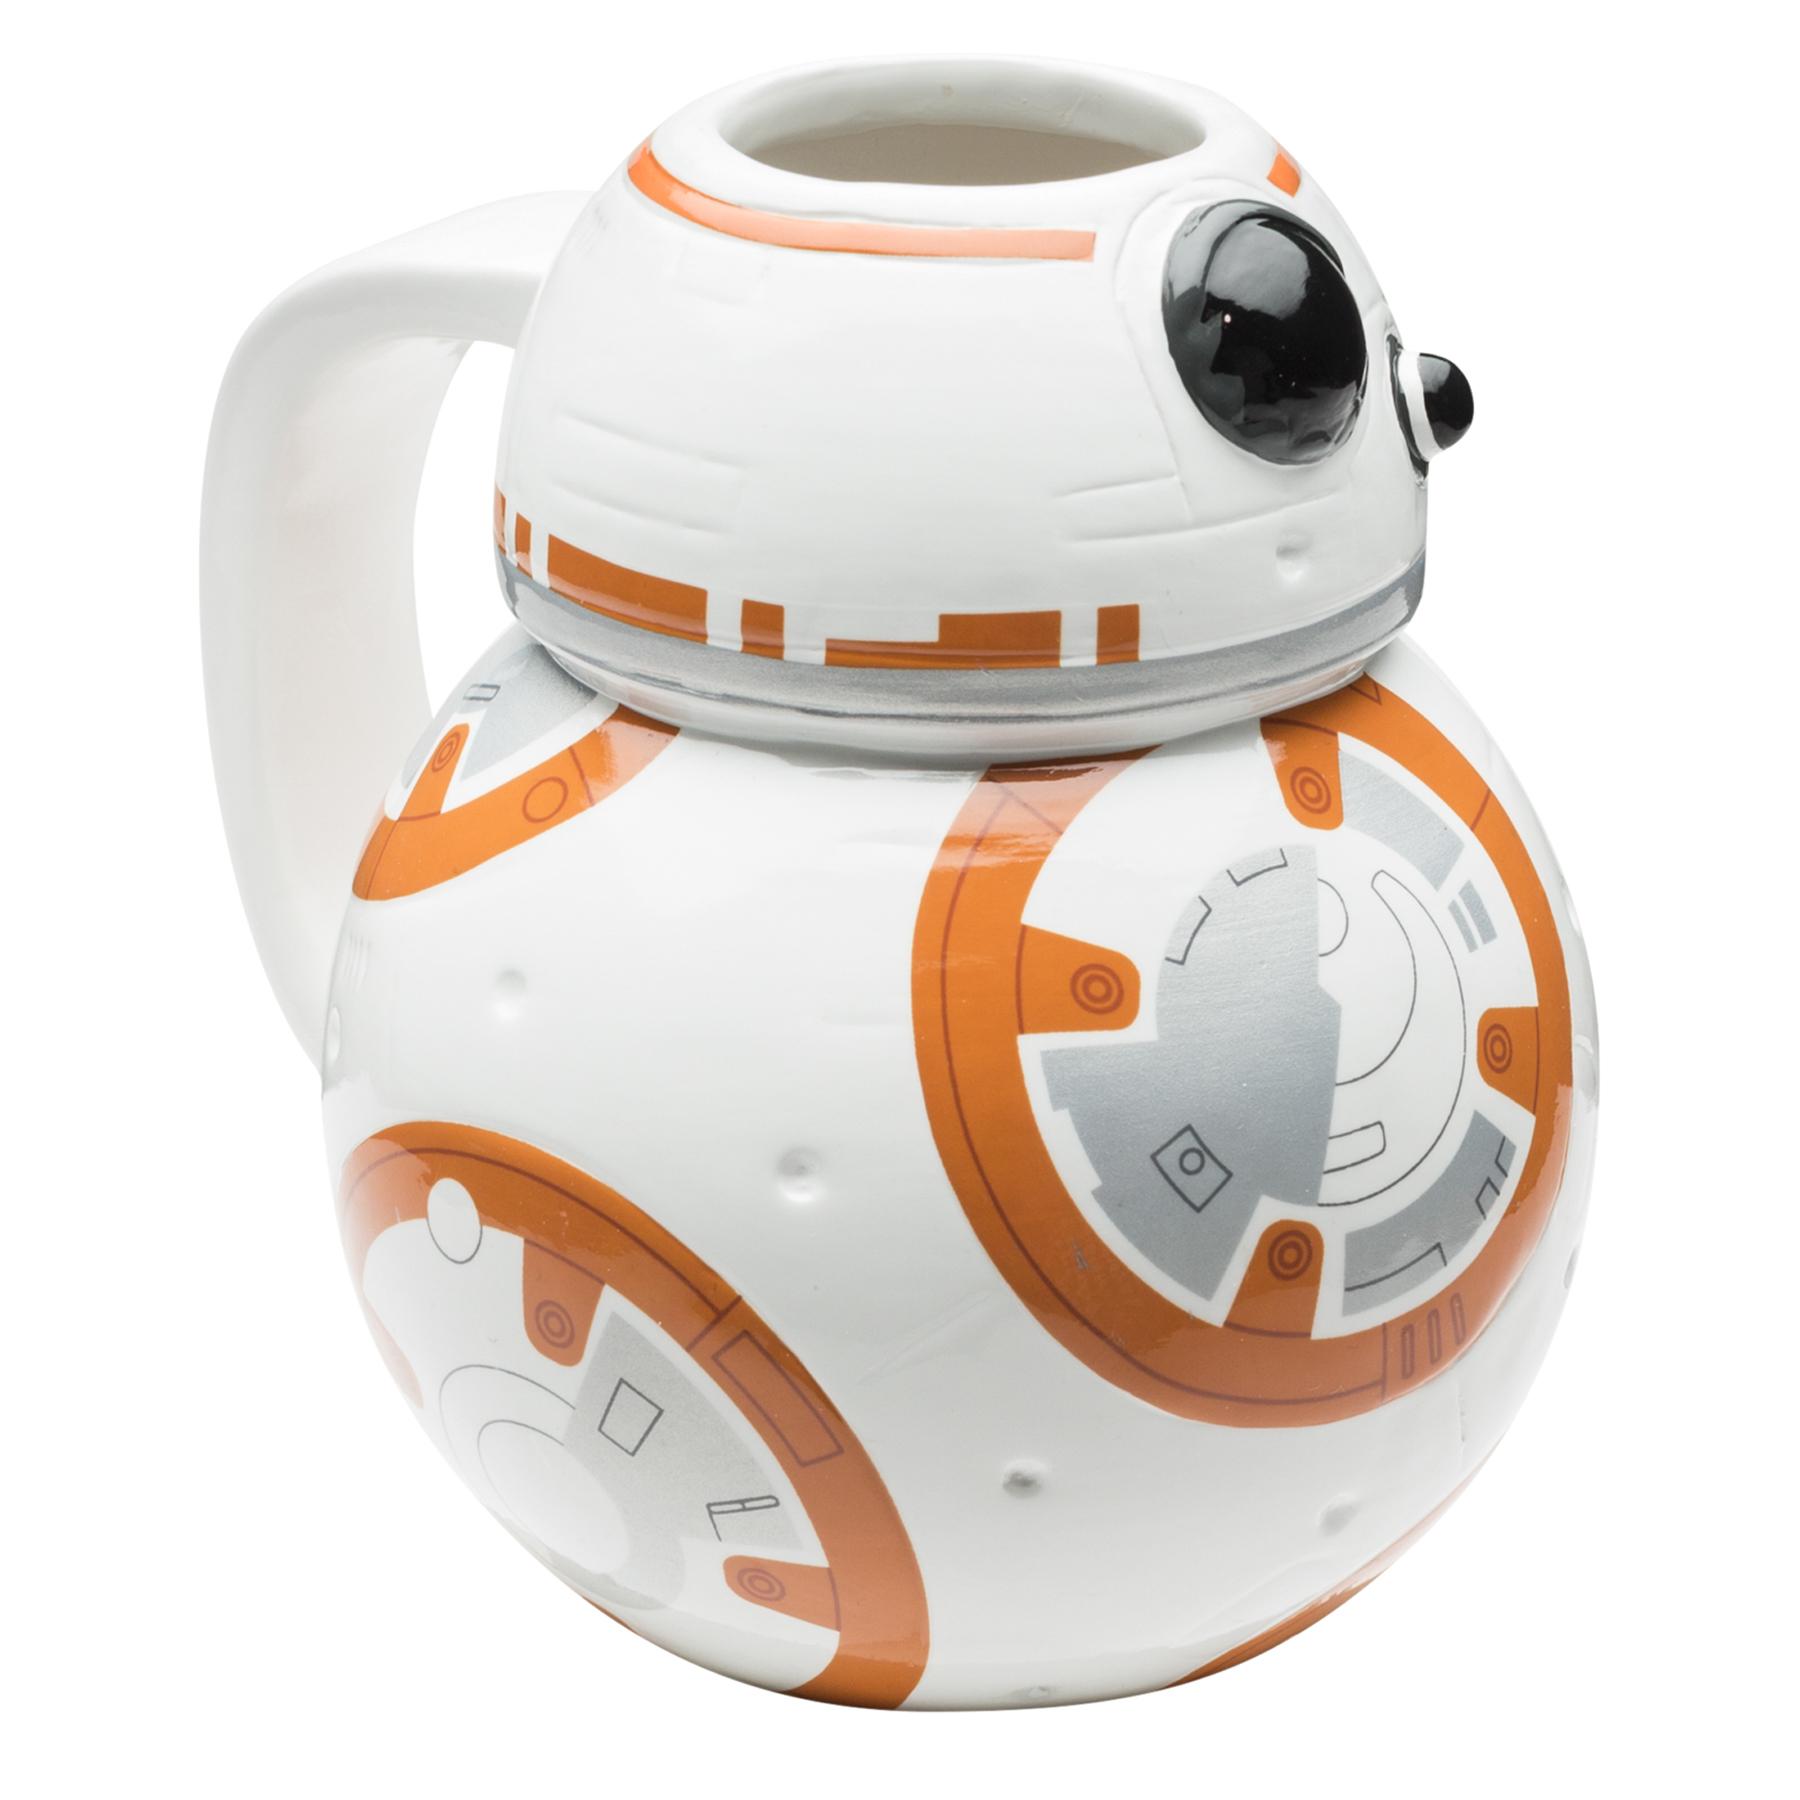 Star Wars: The Force Awakens BB-8 Coffee Mugs https://www.walmart.com/ip/Star-Wars-The-Force-Awakens-BB-8-Coffee-Mugs/48822250 CR: Walmart